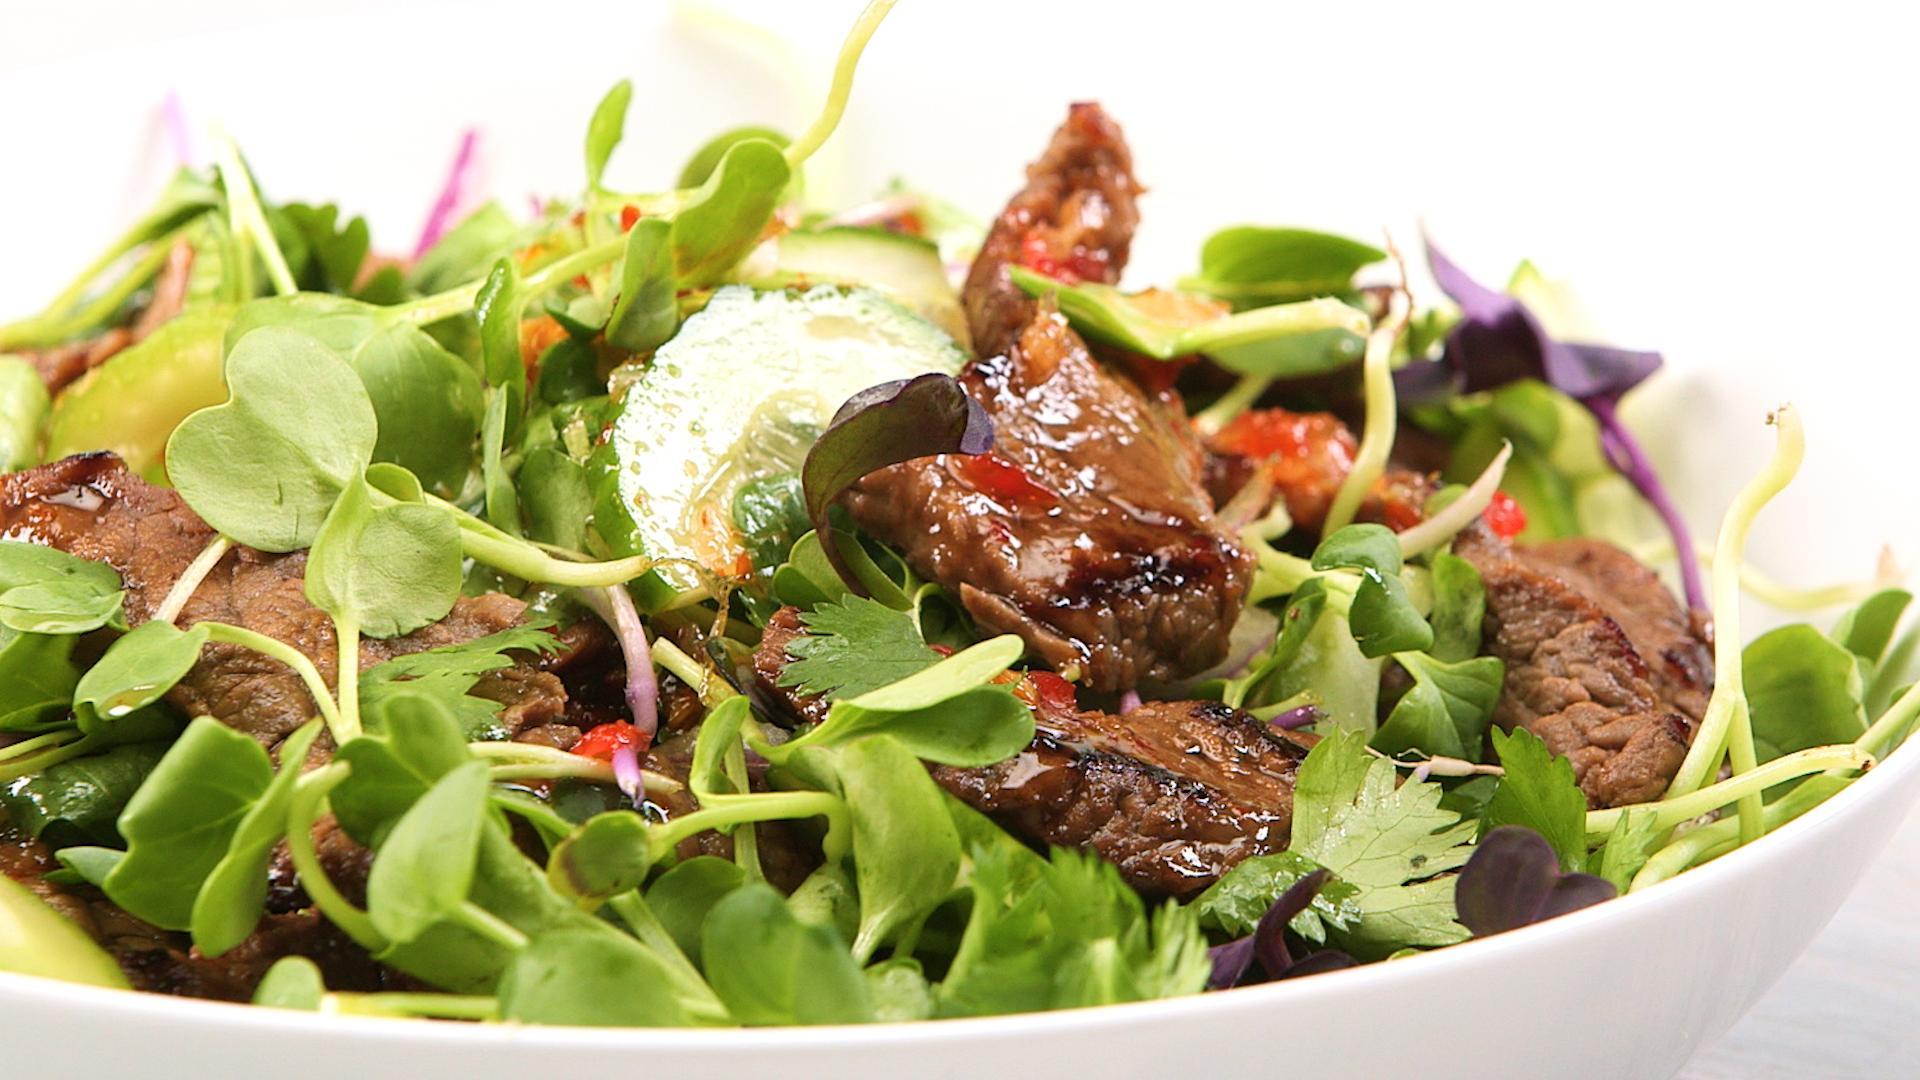 How to Make Thai Beef Salad